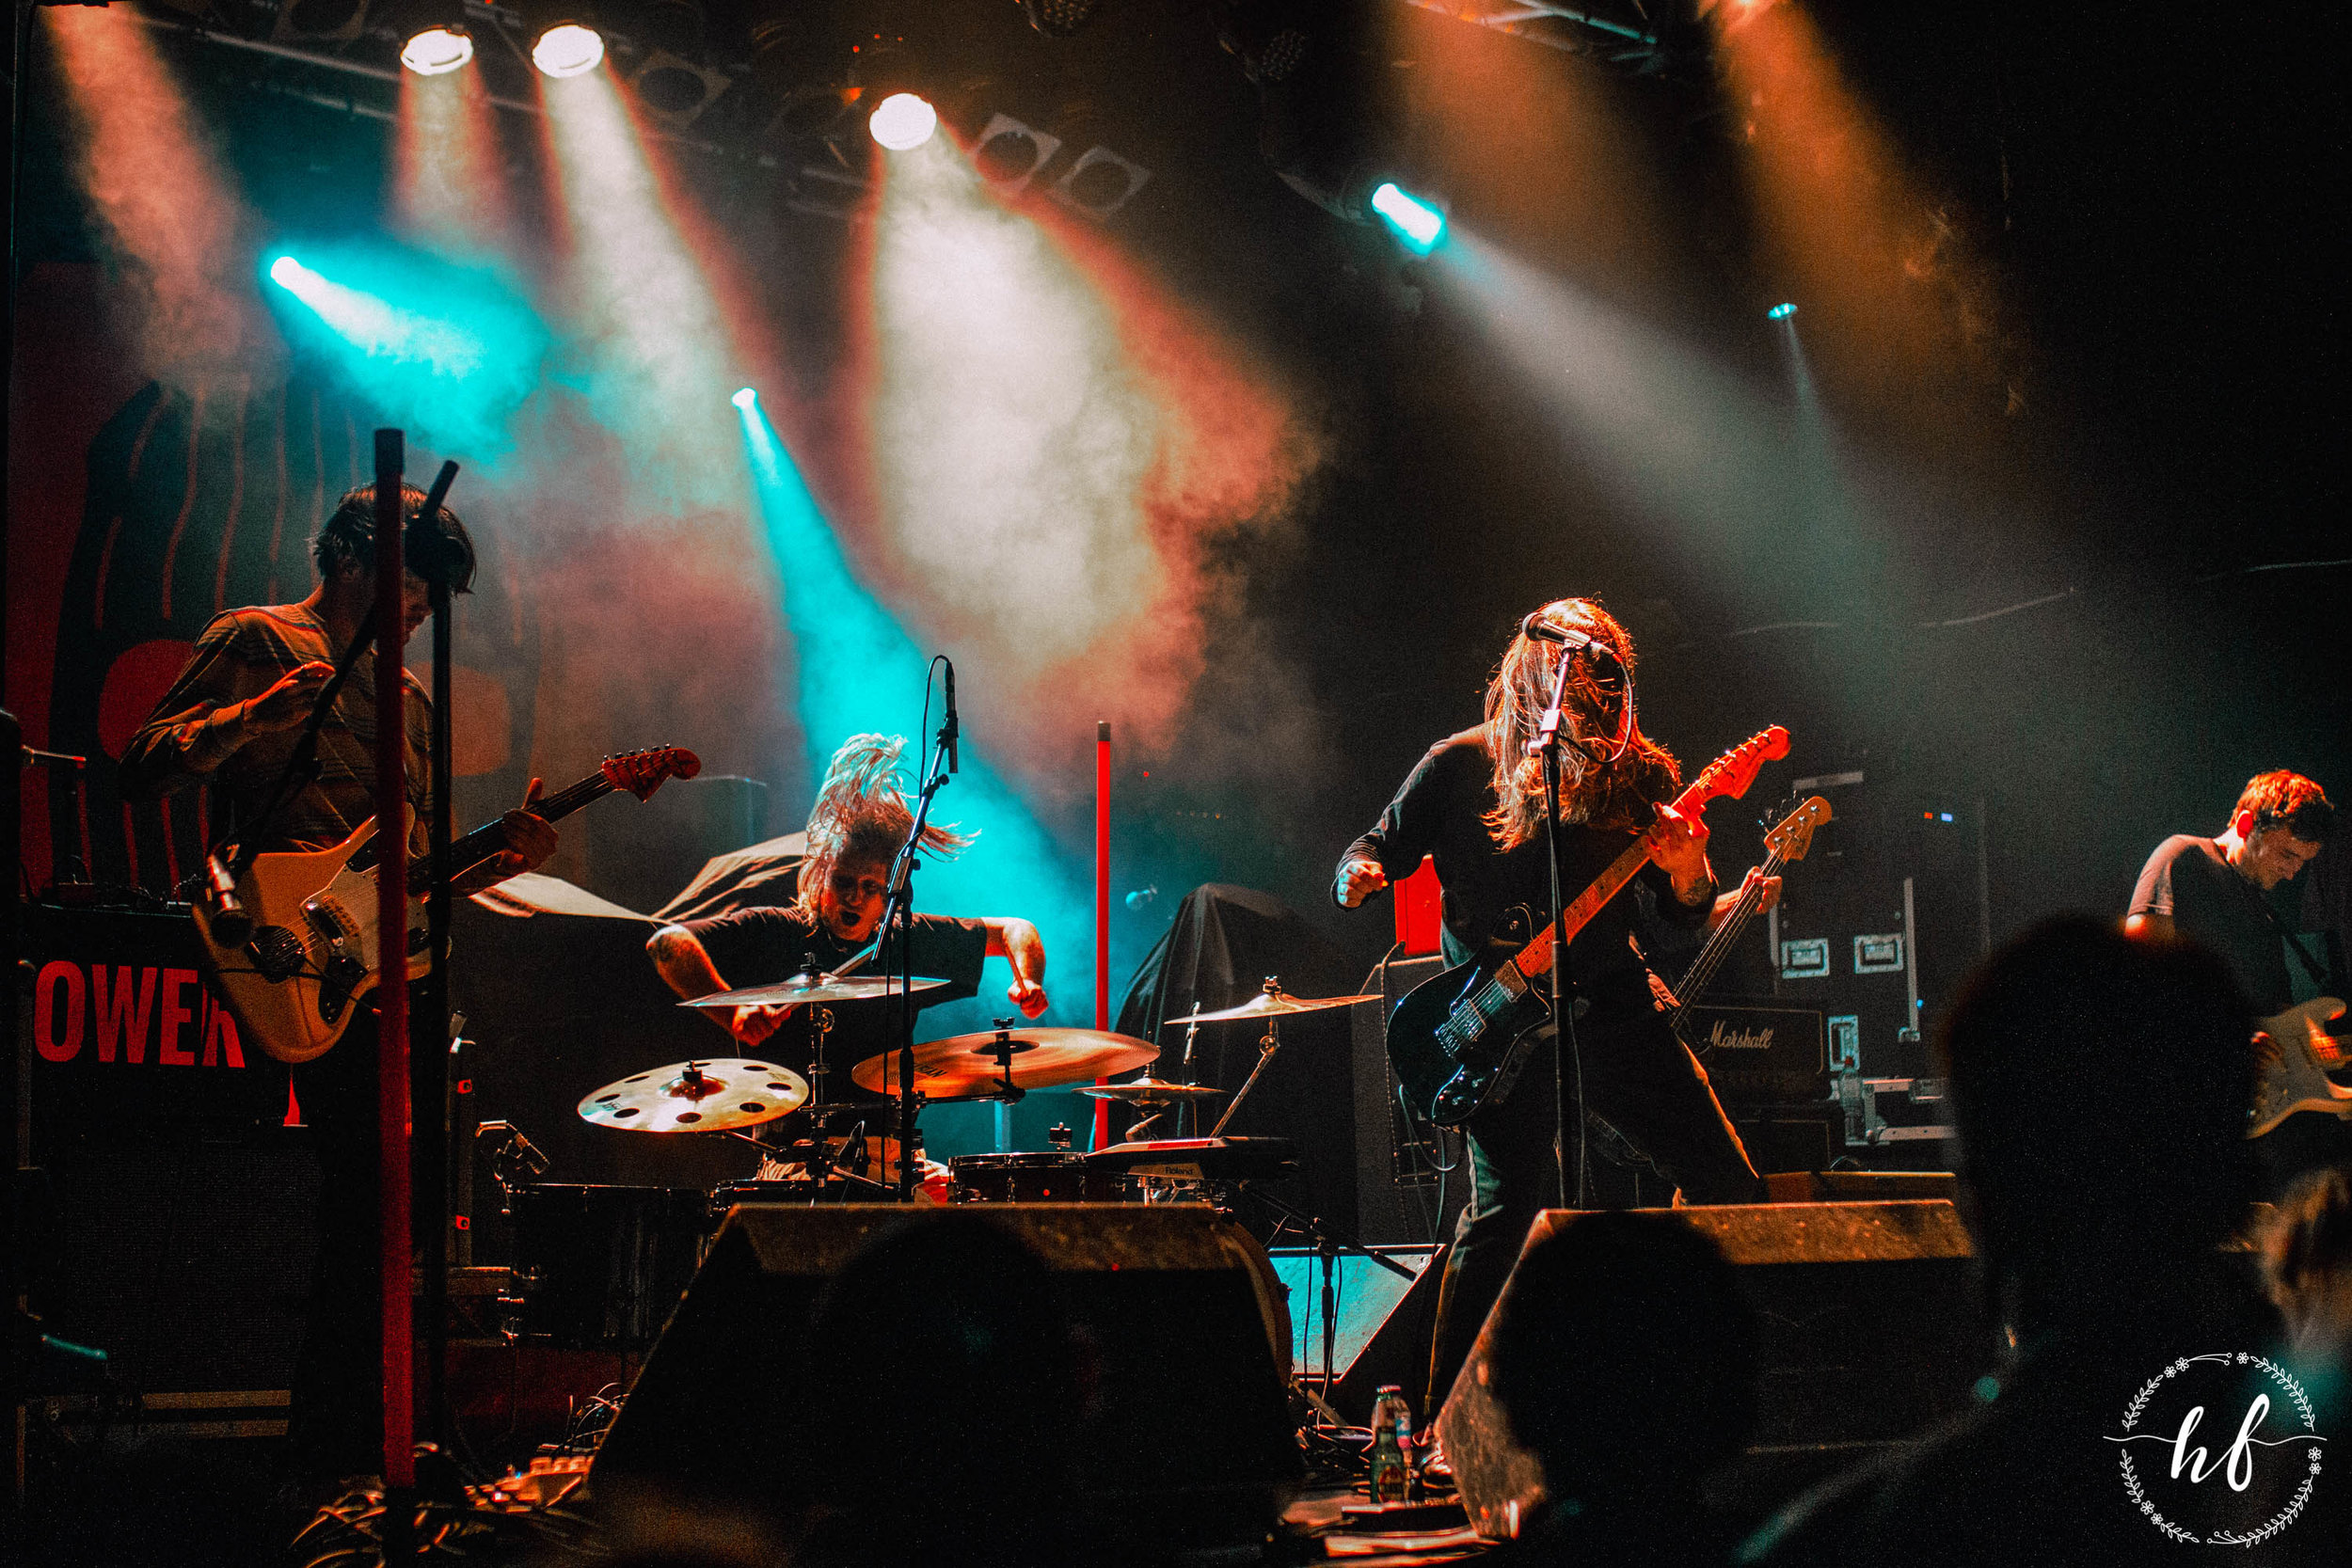 Wallflower - Electric Ballroom - 22-09-2018 - London -15.jpg